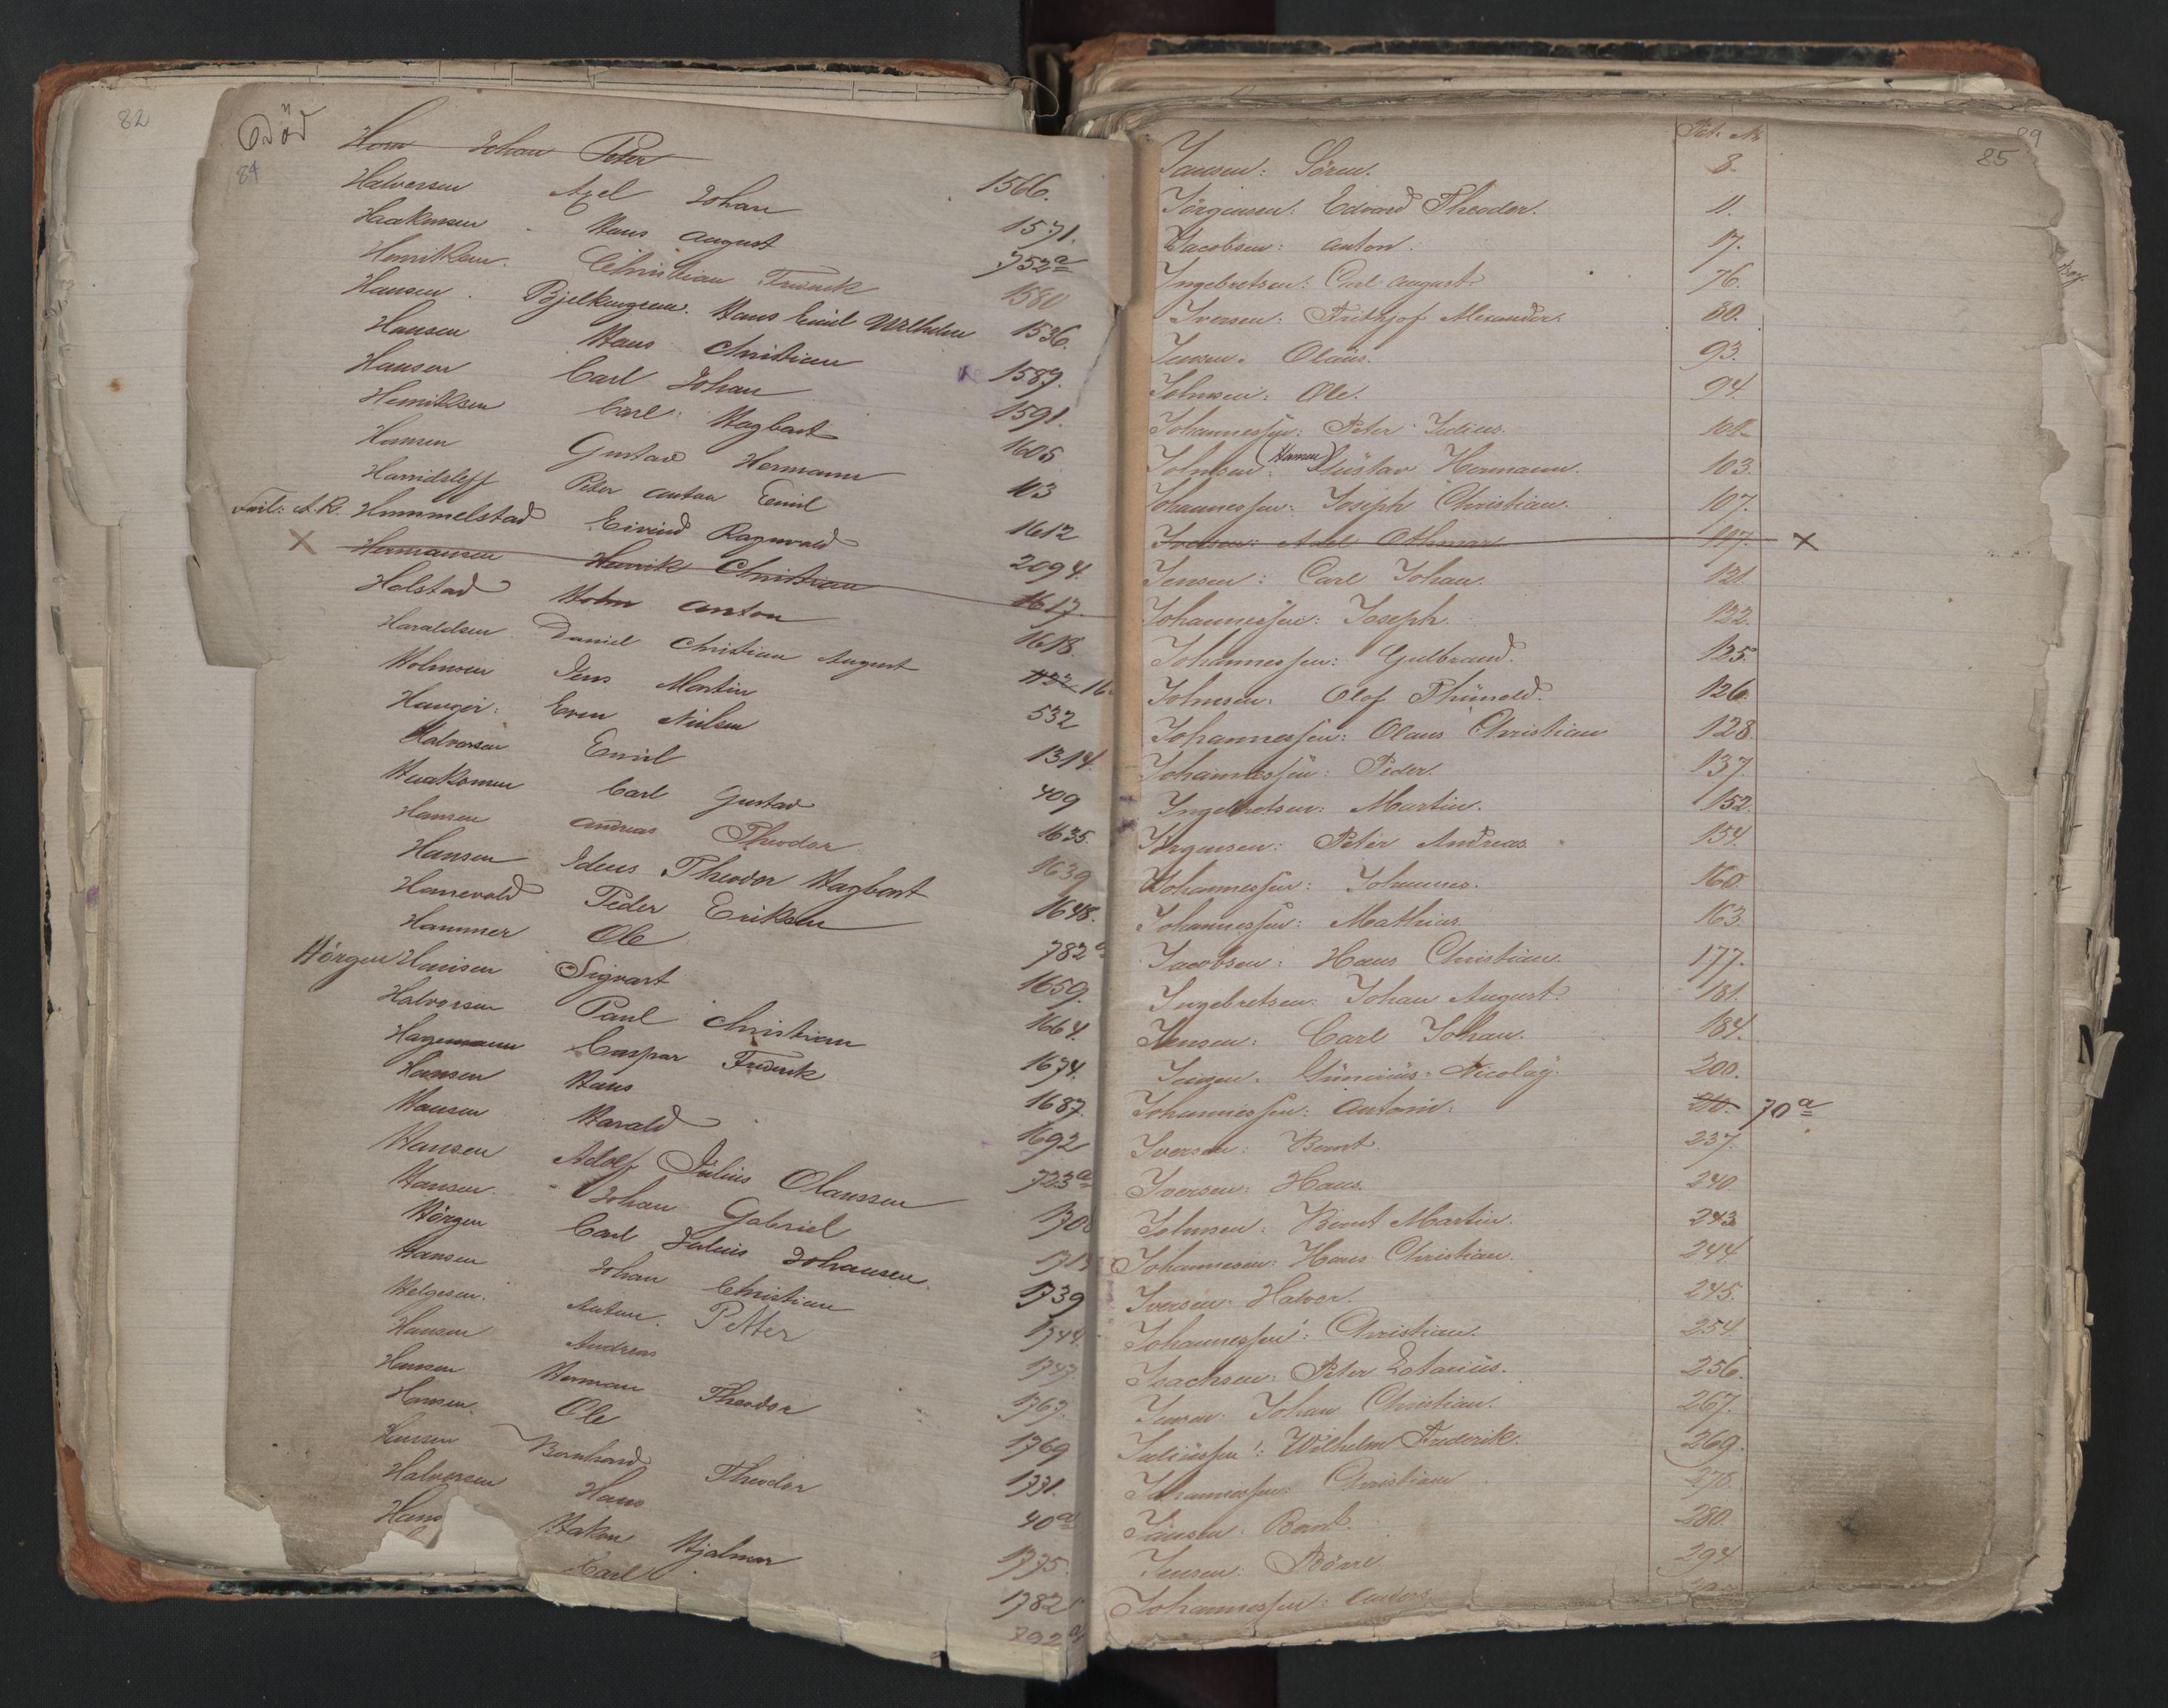 SAO, Oslo sjømannskontor, F/Fa/L0001: Register for Kristiania krets, 1866-1891, s. 84-85